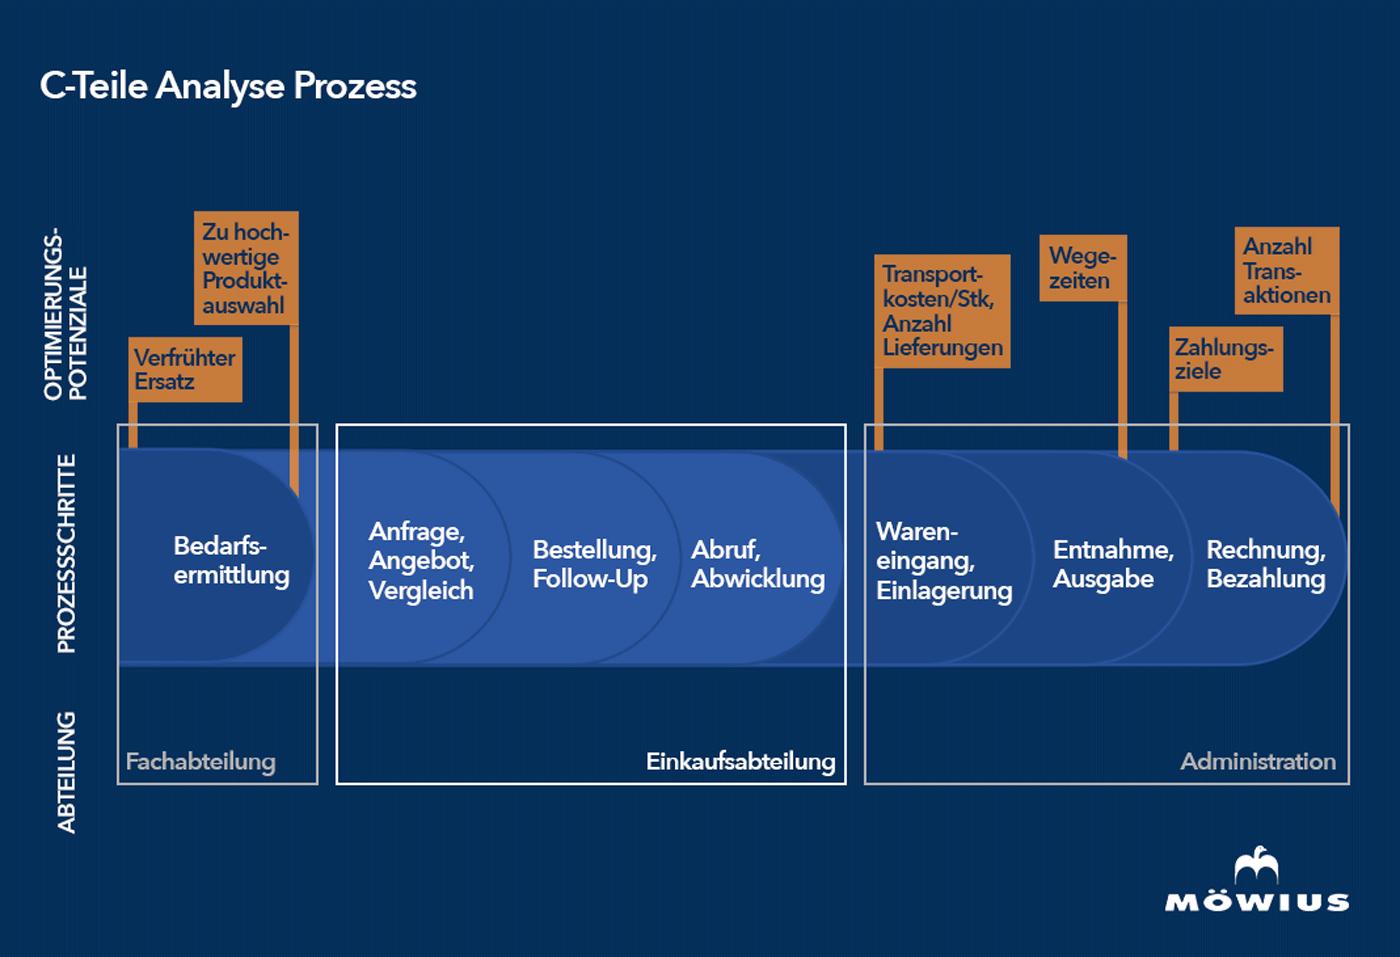 C-Teile-Management Analyse Prozess